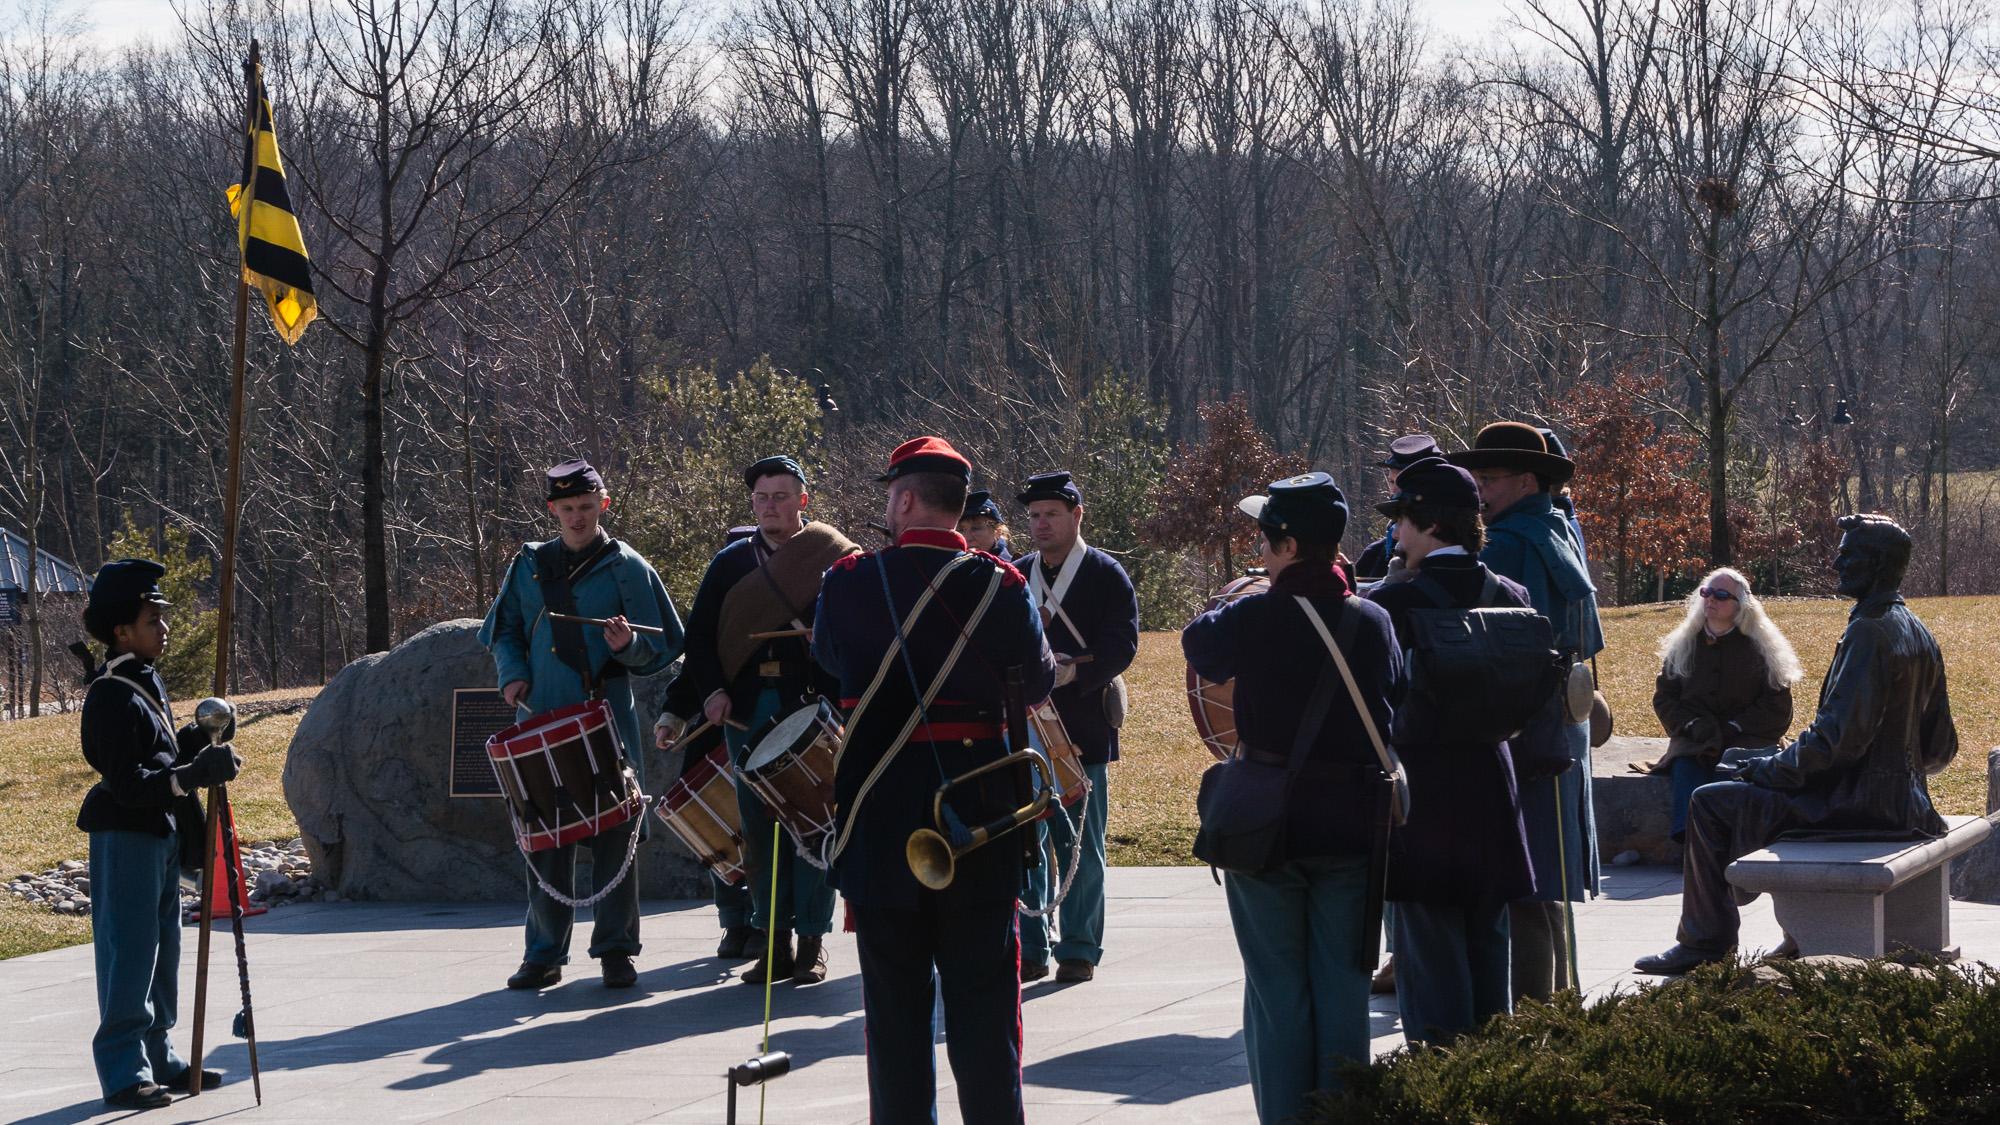 130210-133828_Gettysburg